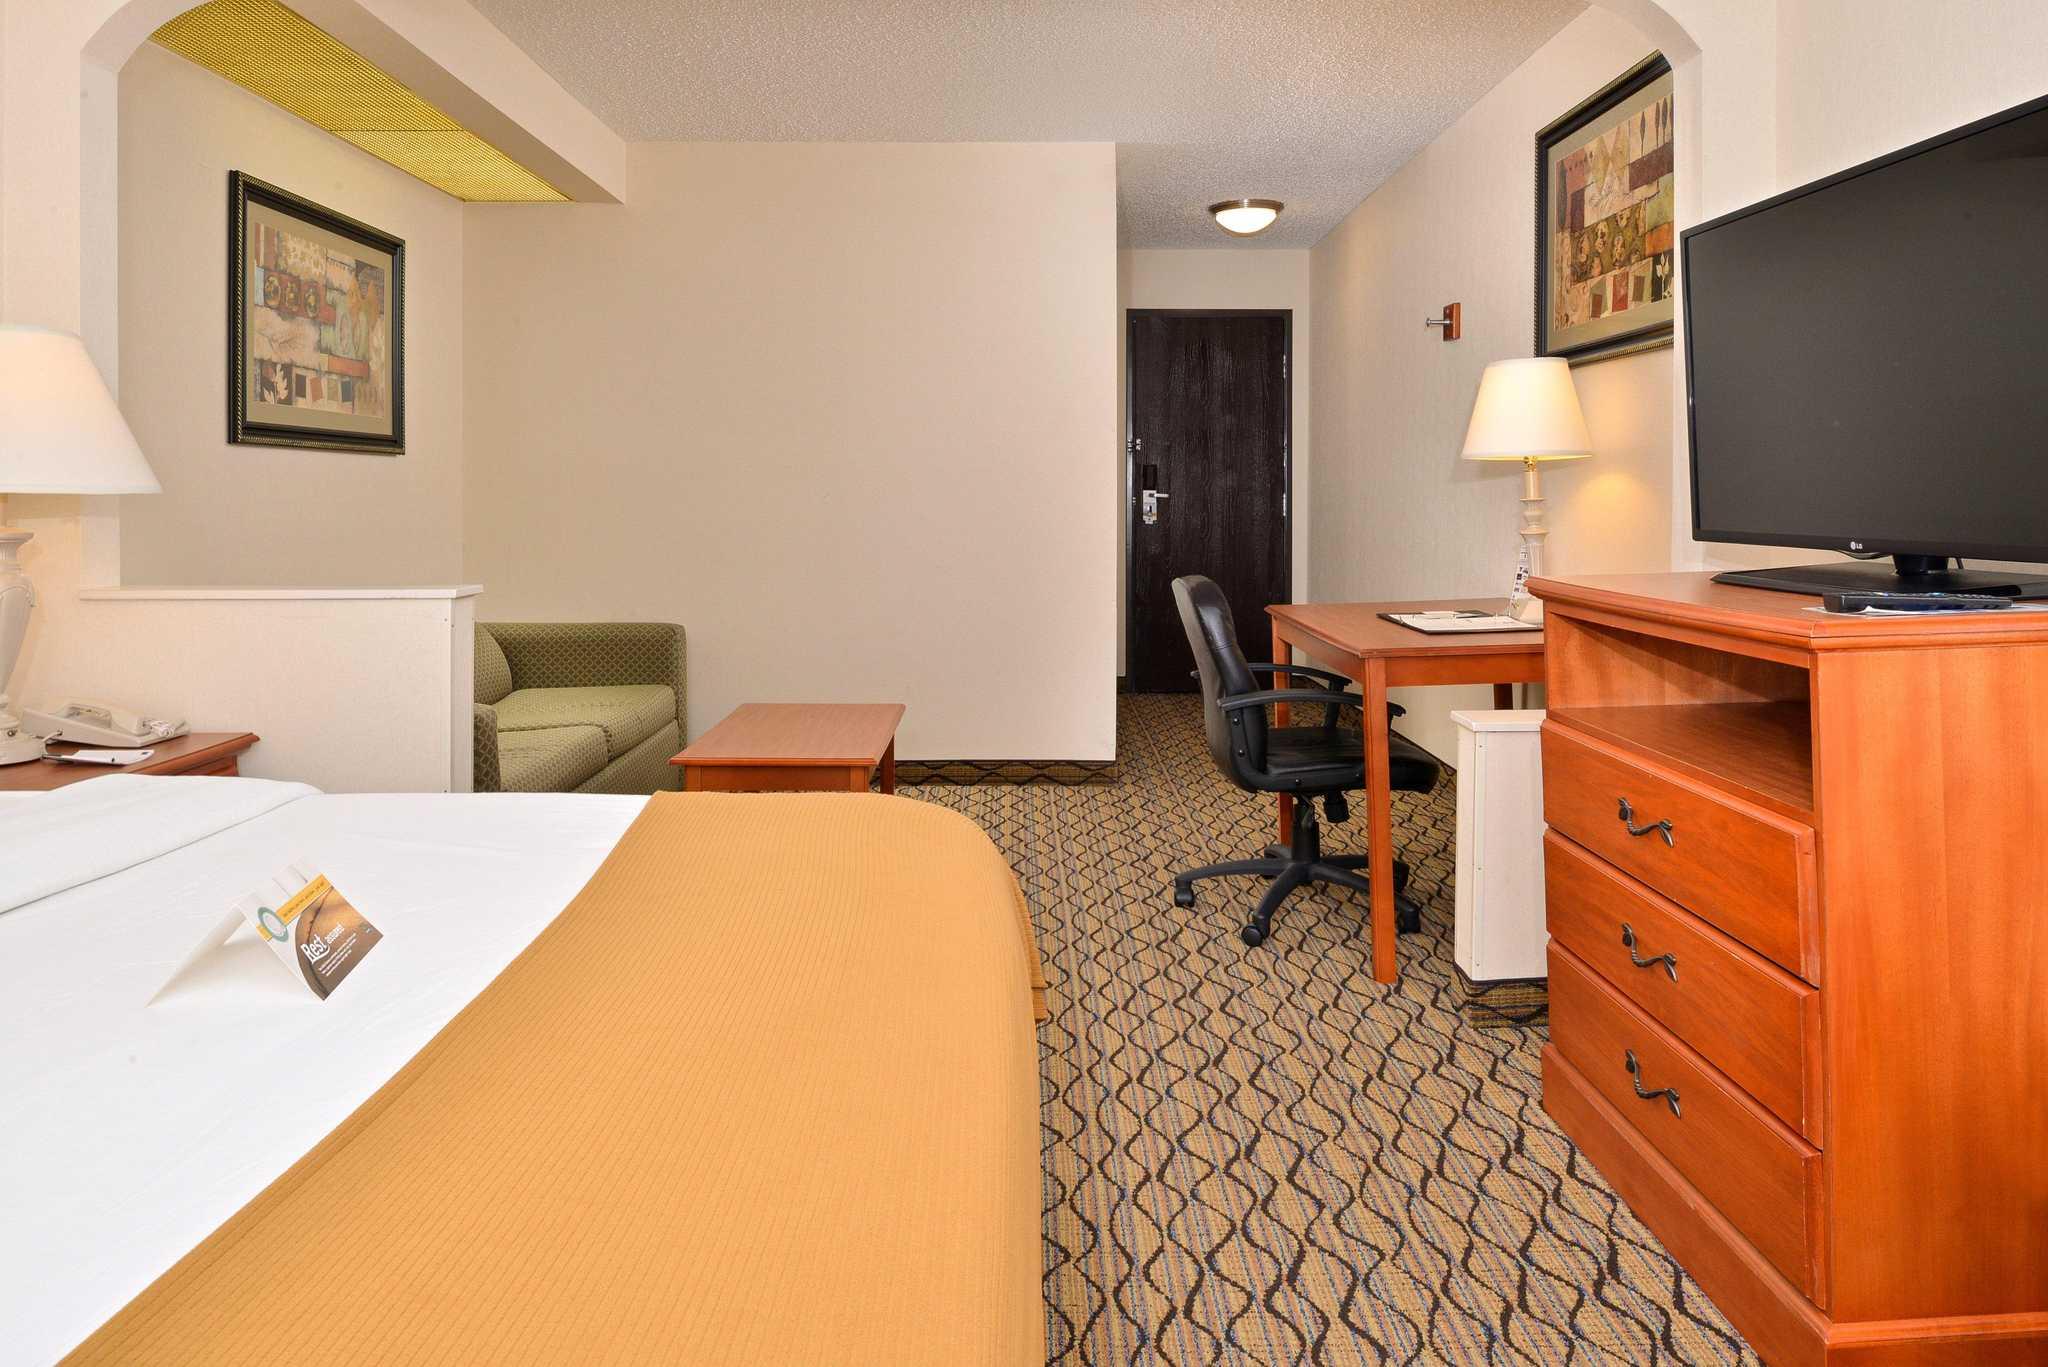 Quality Inn & Suites Jefferson City image 13